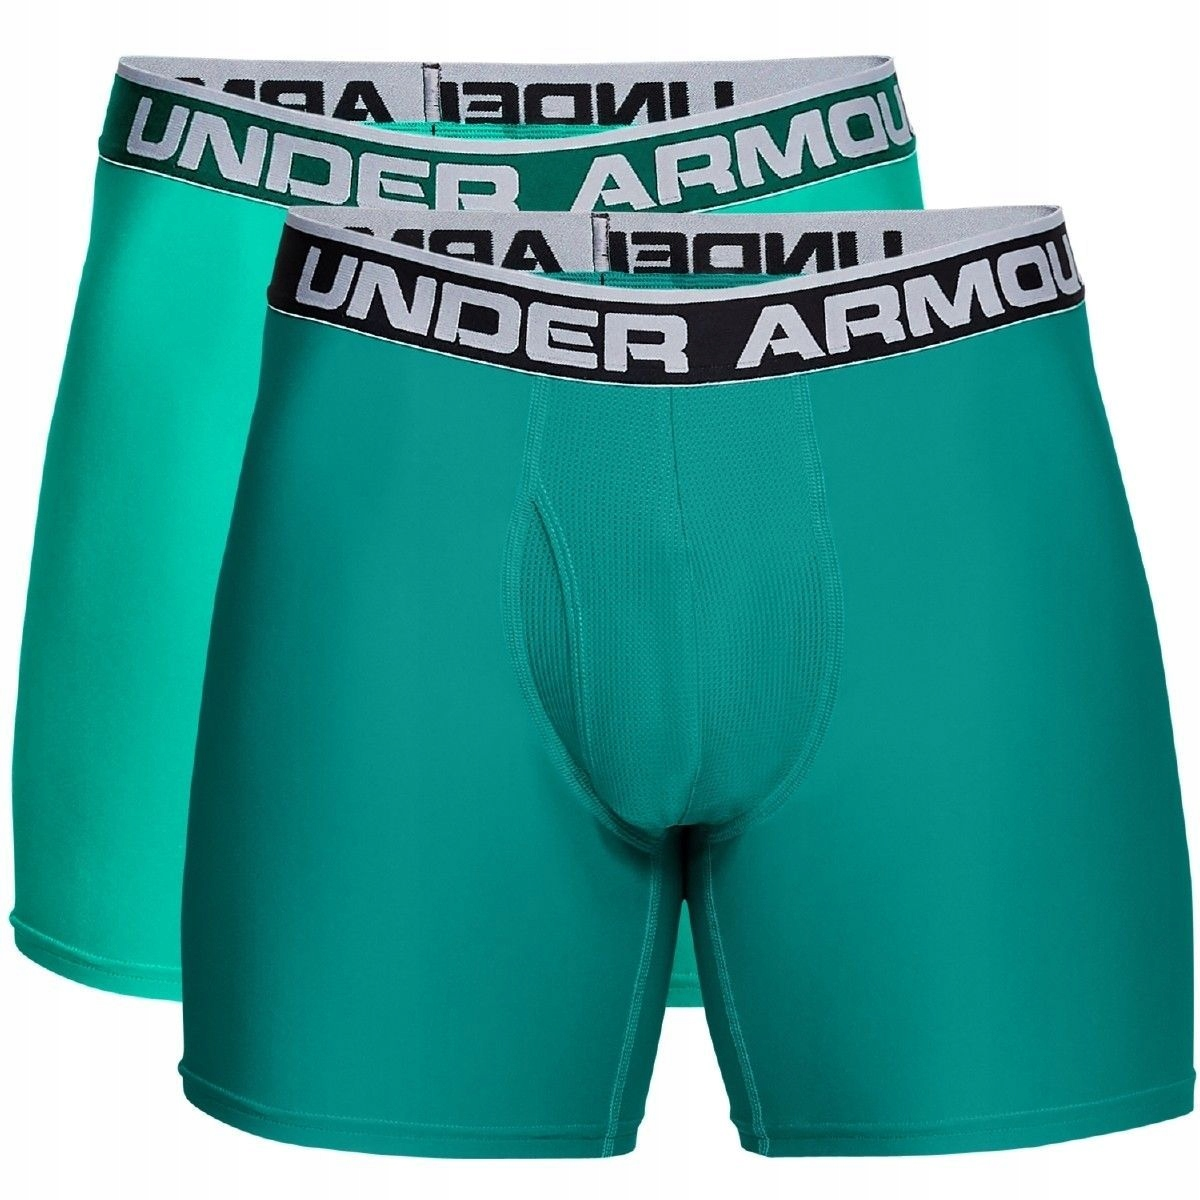 Bokserki Under Armour 6cali 2-Pak 1282508-381 # S